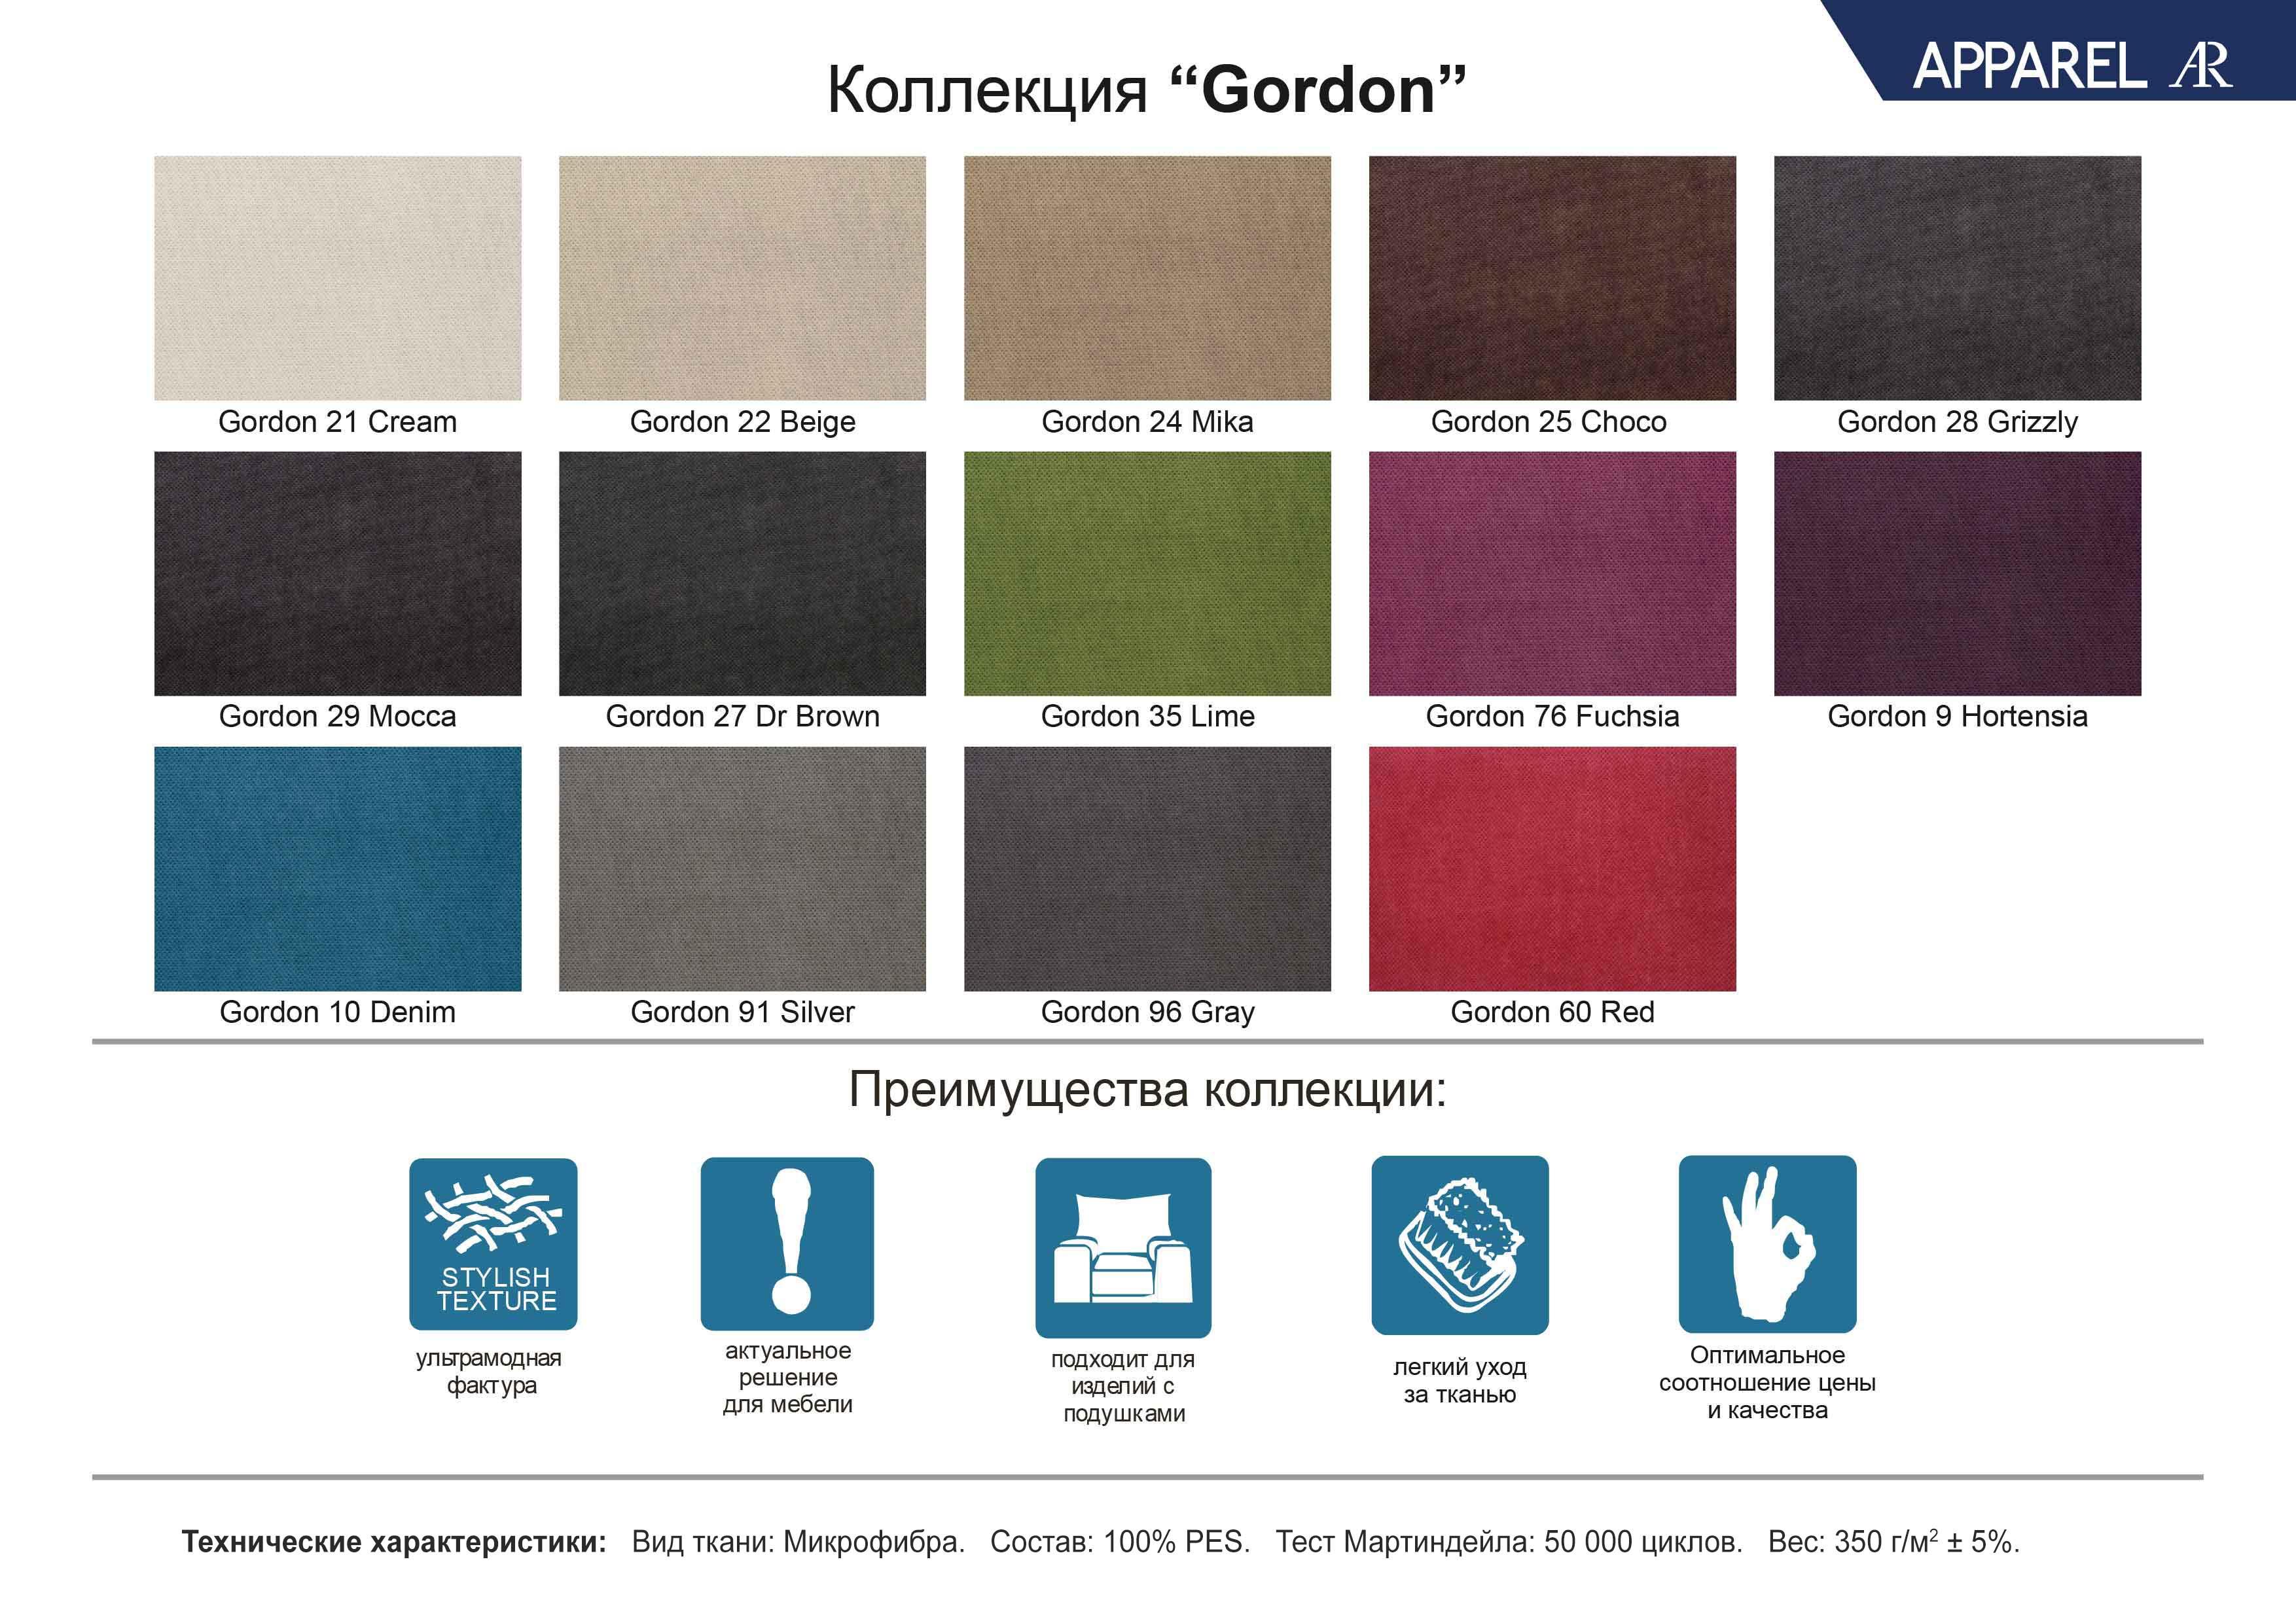 Картинки по запросу apparel gordon